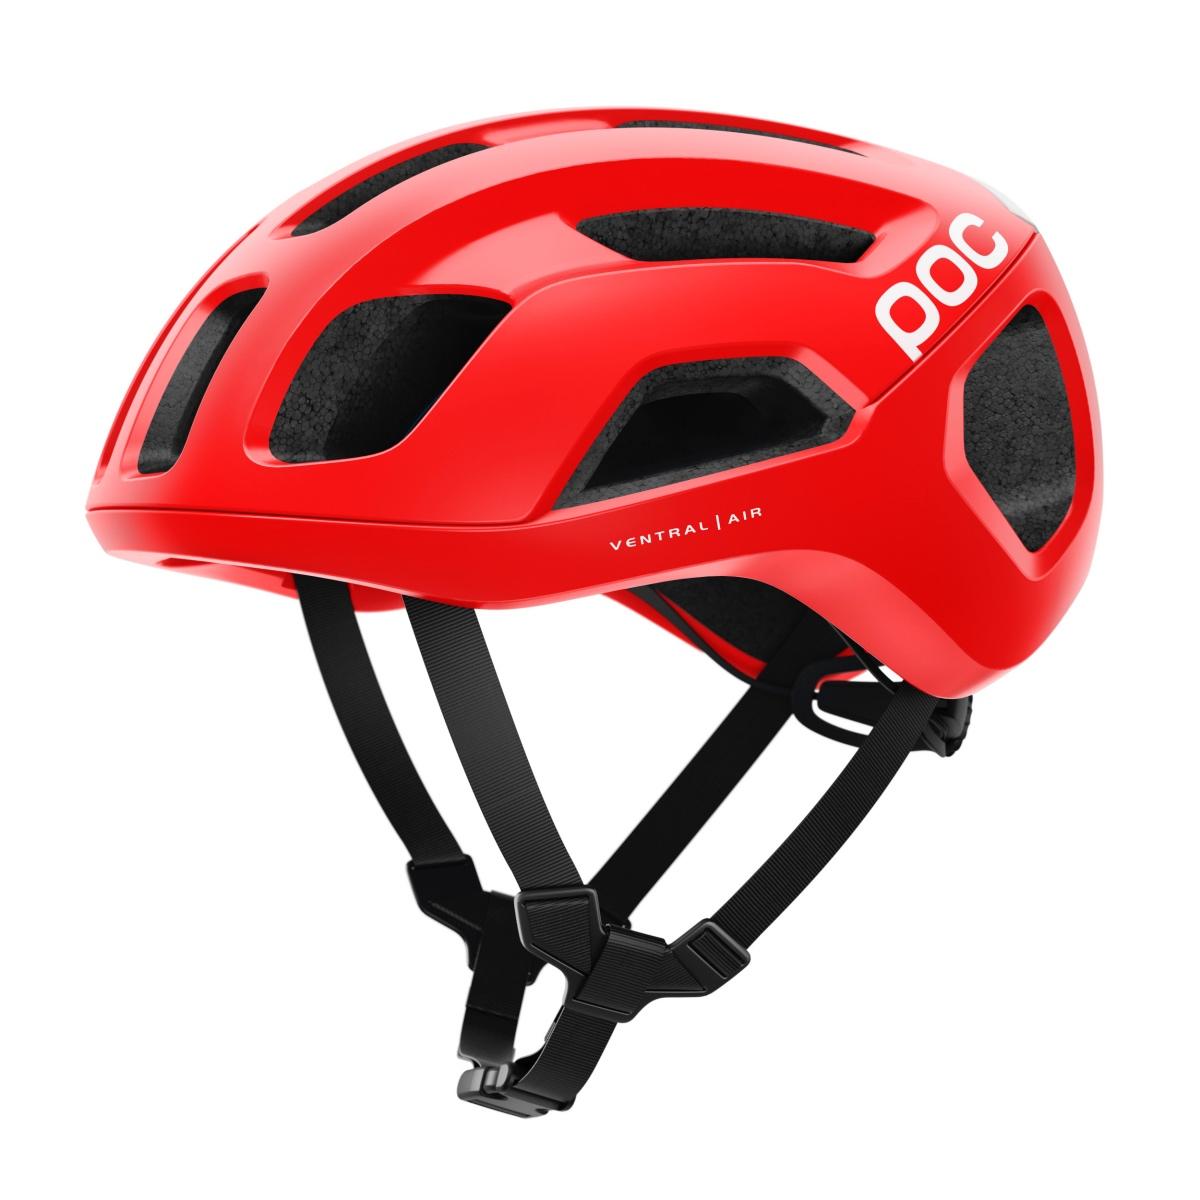 POC Ventral Air helmet